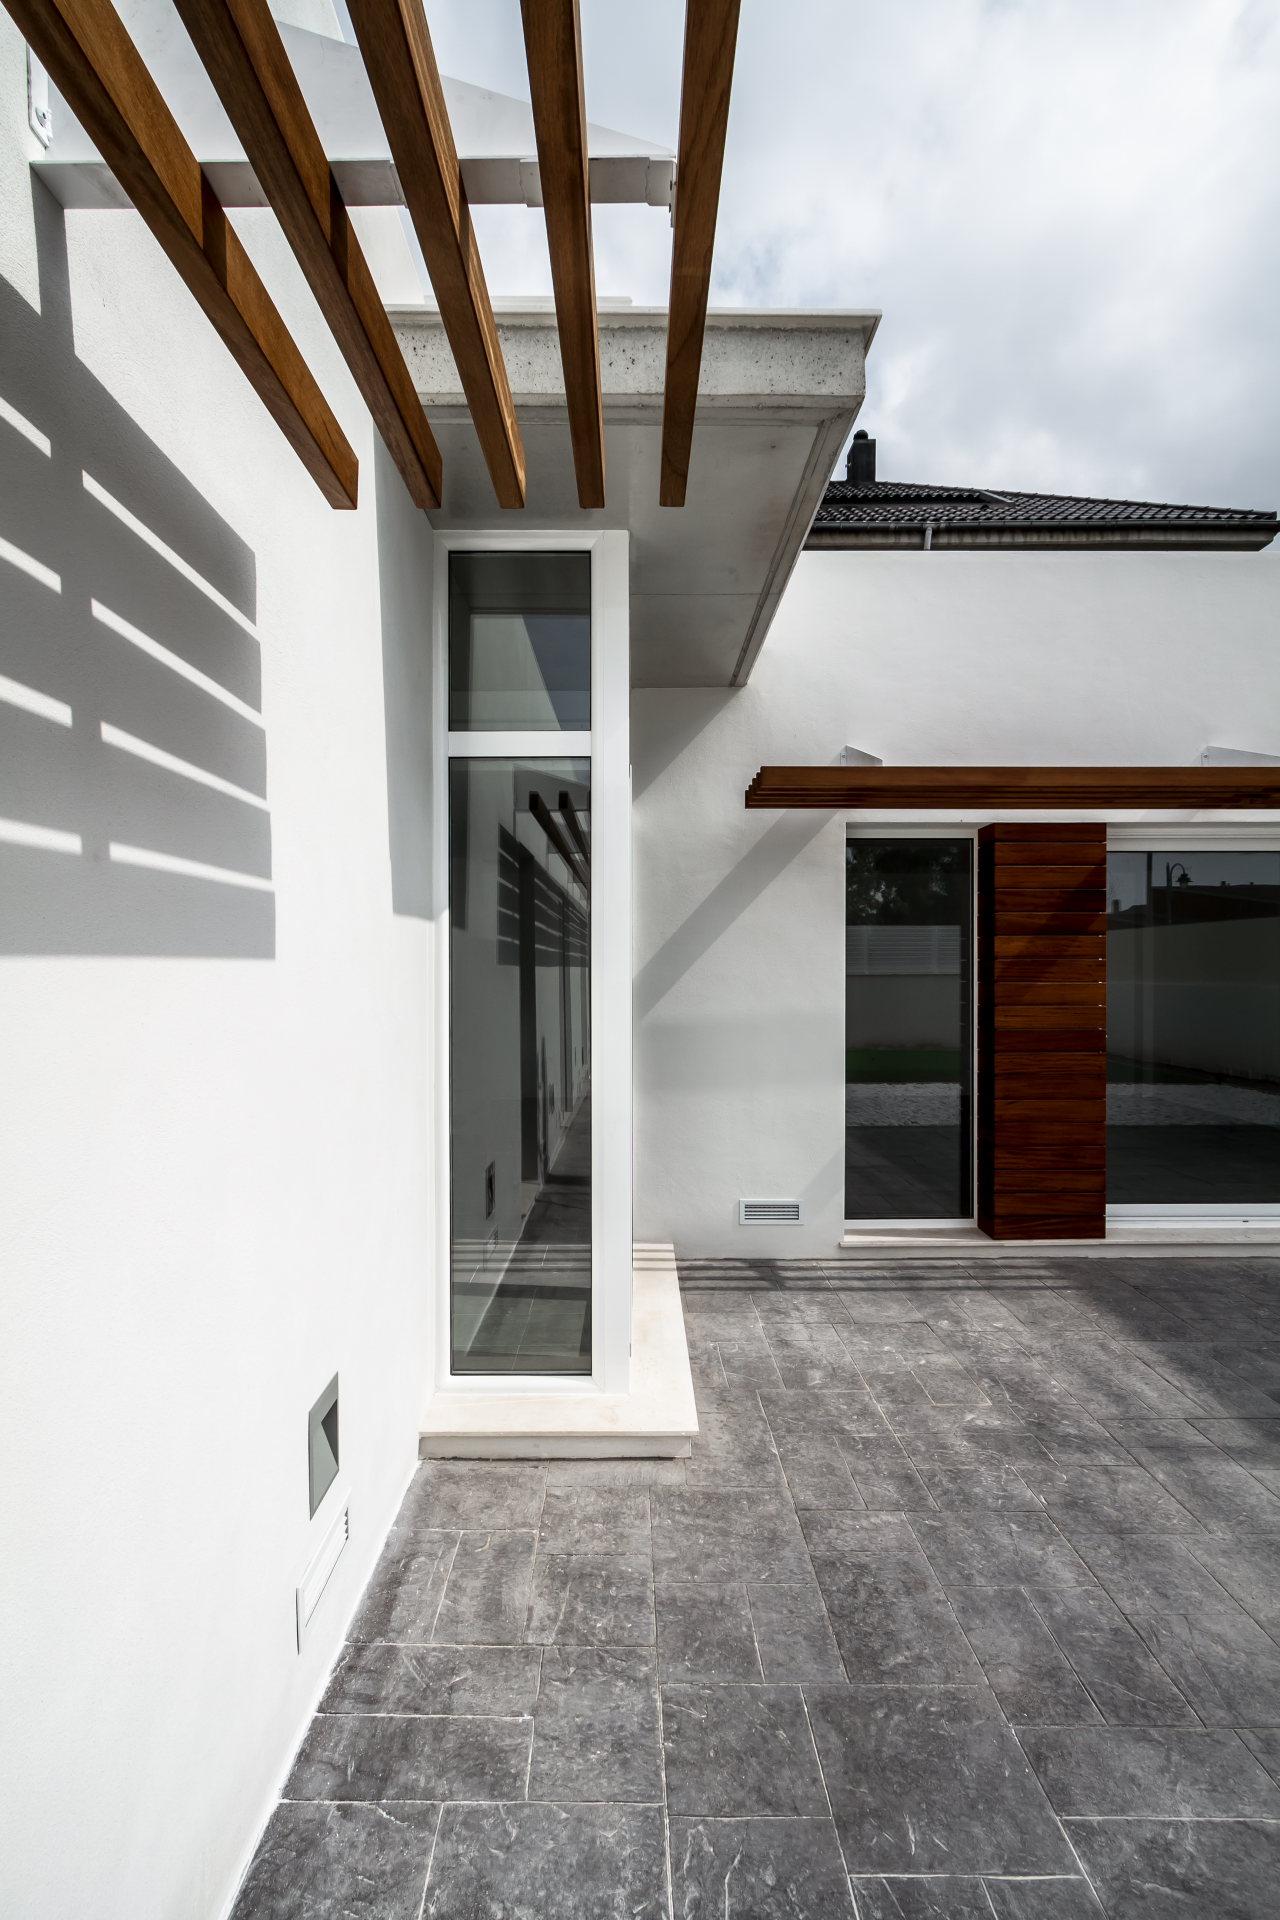 fotografia-arquitectura-valencia-german-cabo-viraje-museros (21)